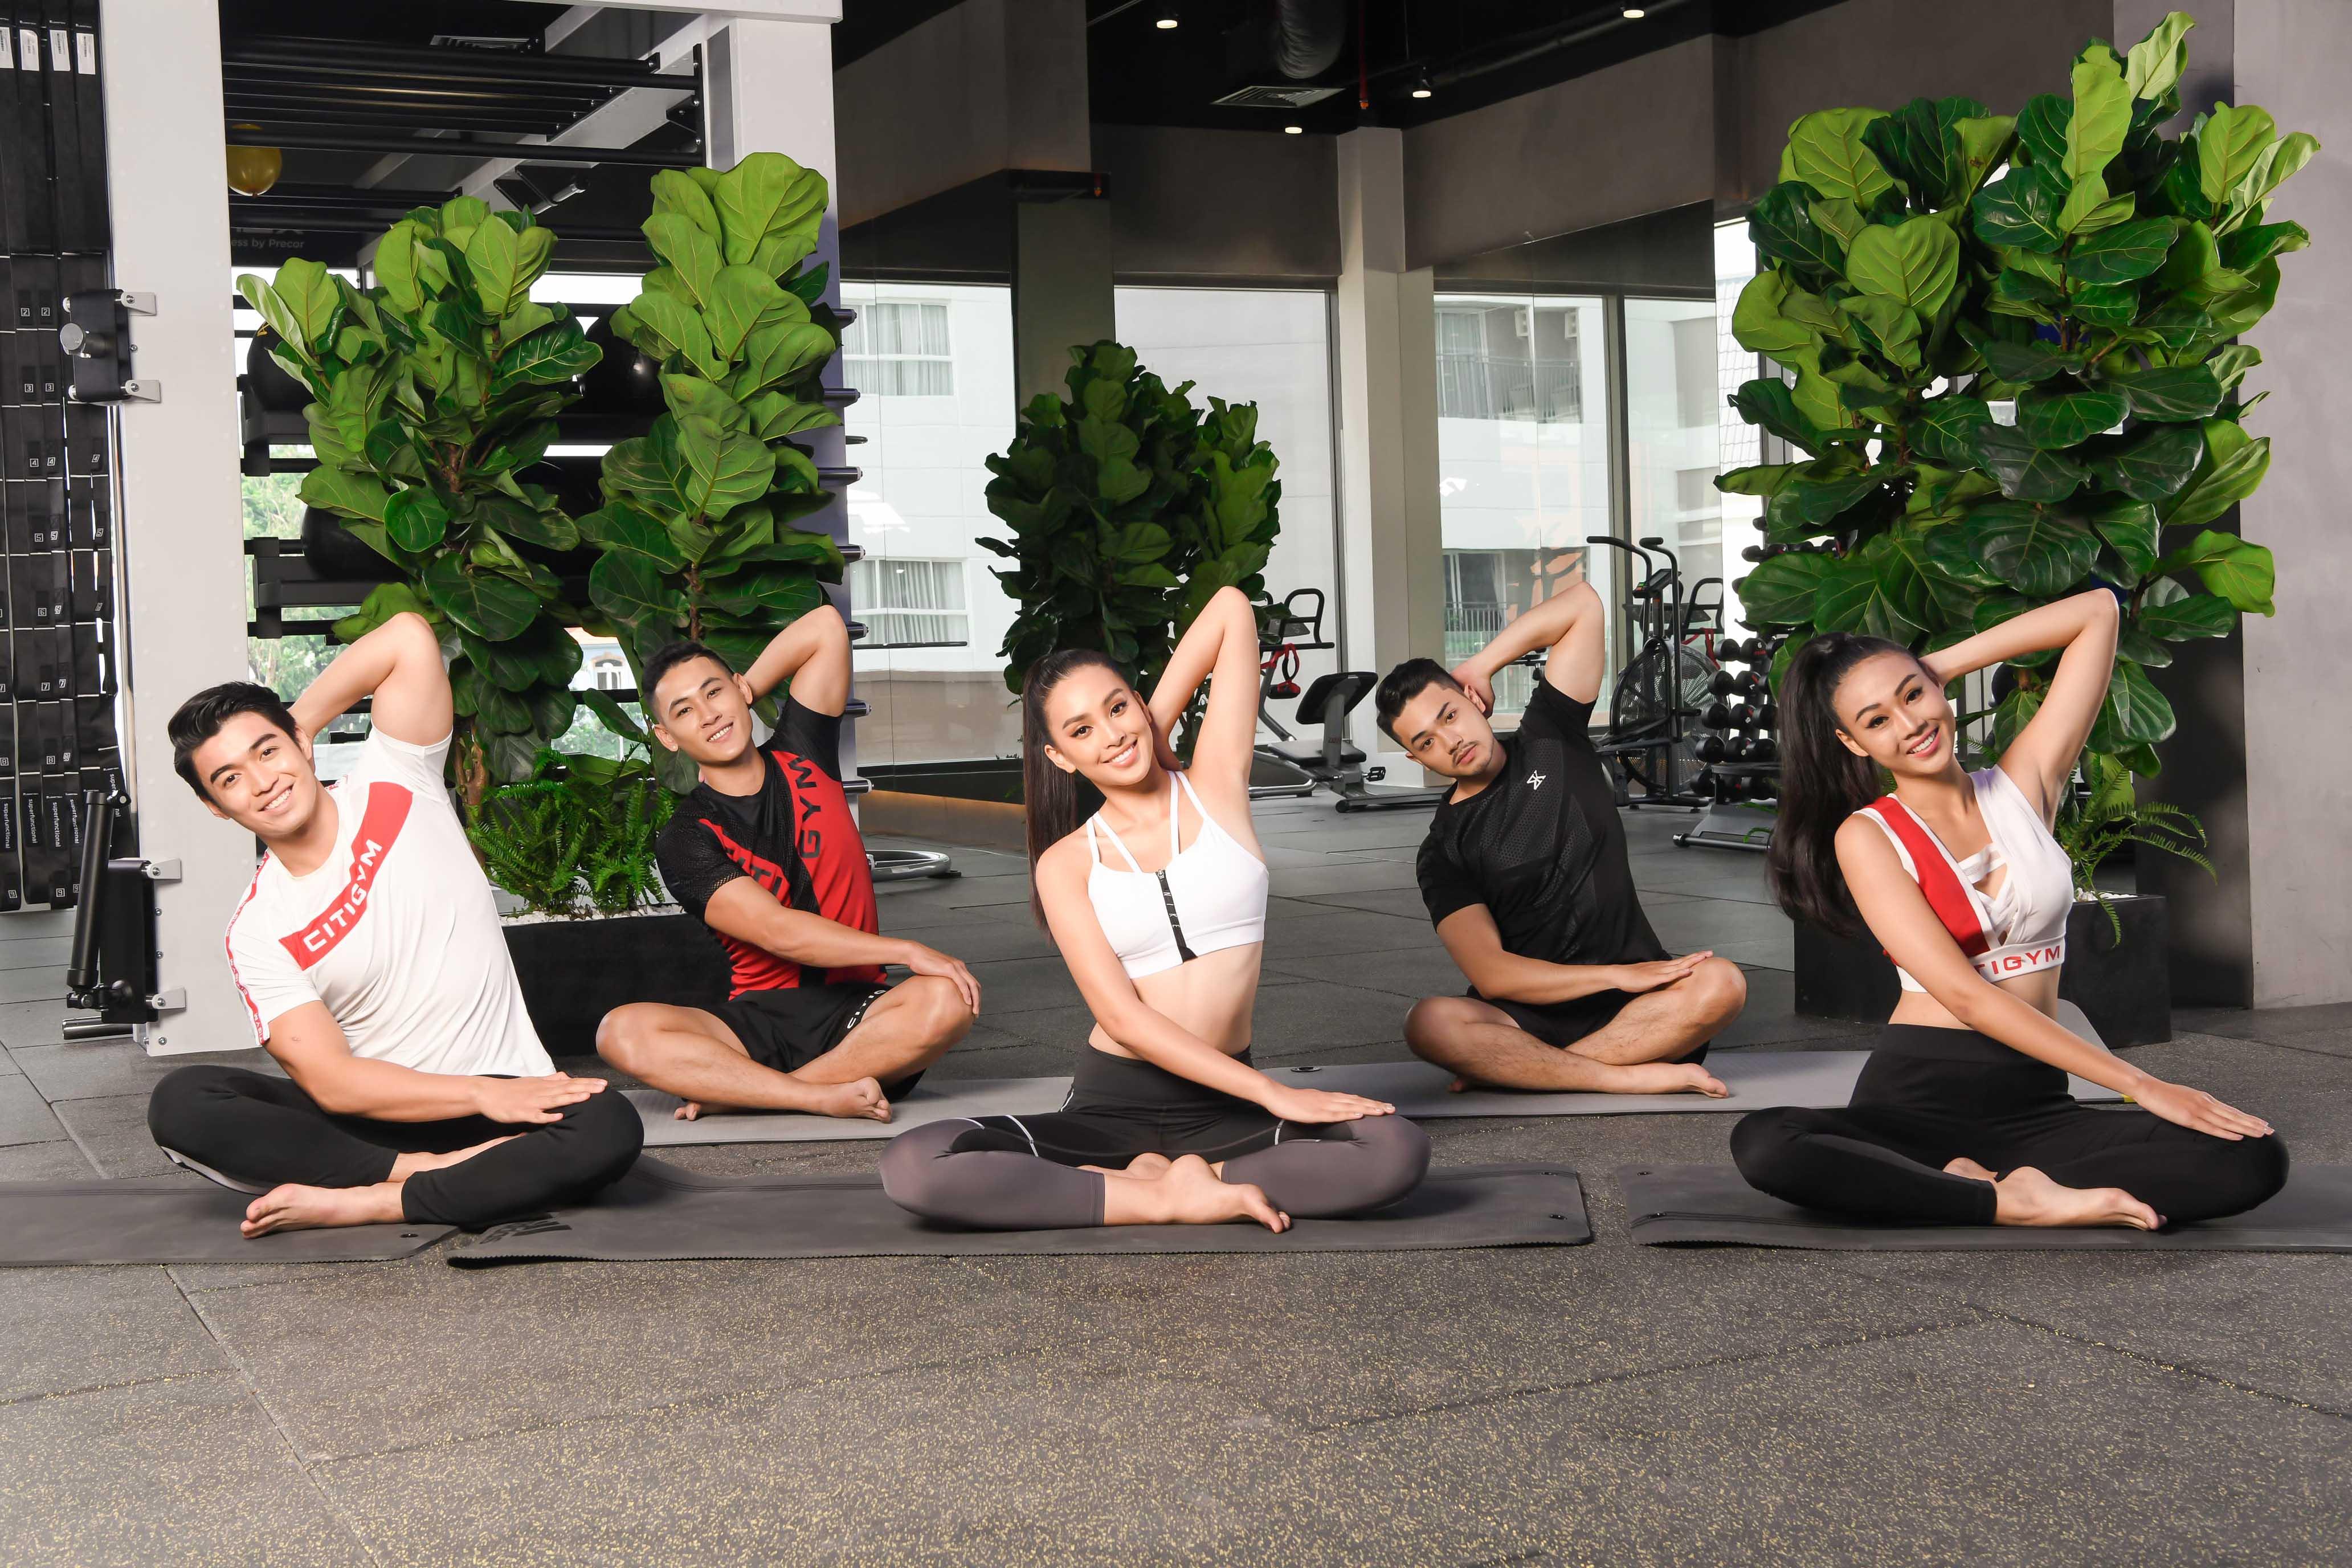 tap gym citigym - hoa hau tieu vy tap yoga - elle vietnam